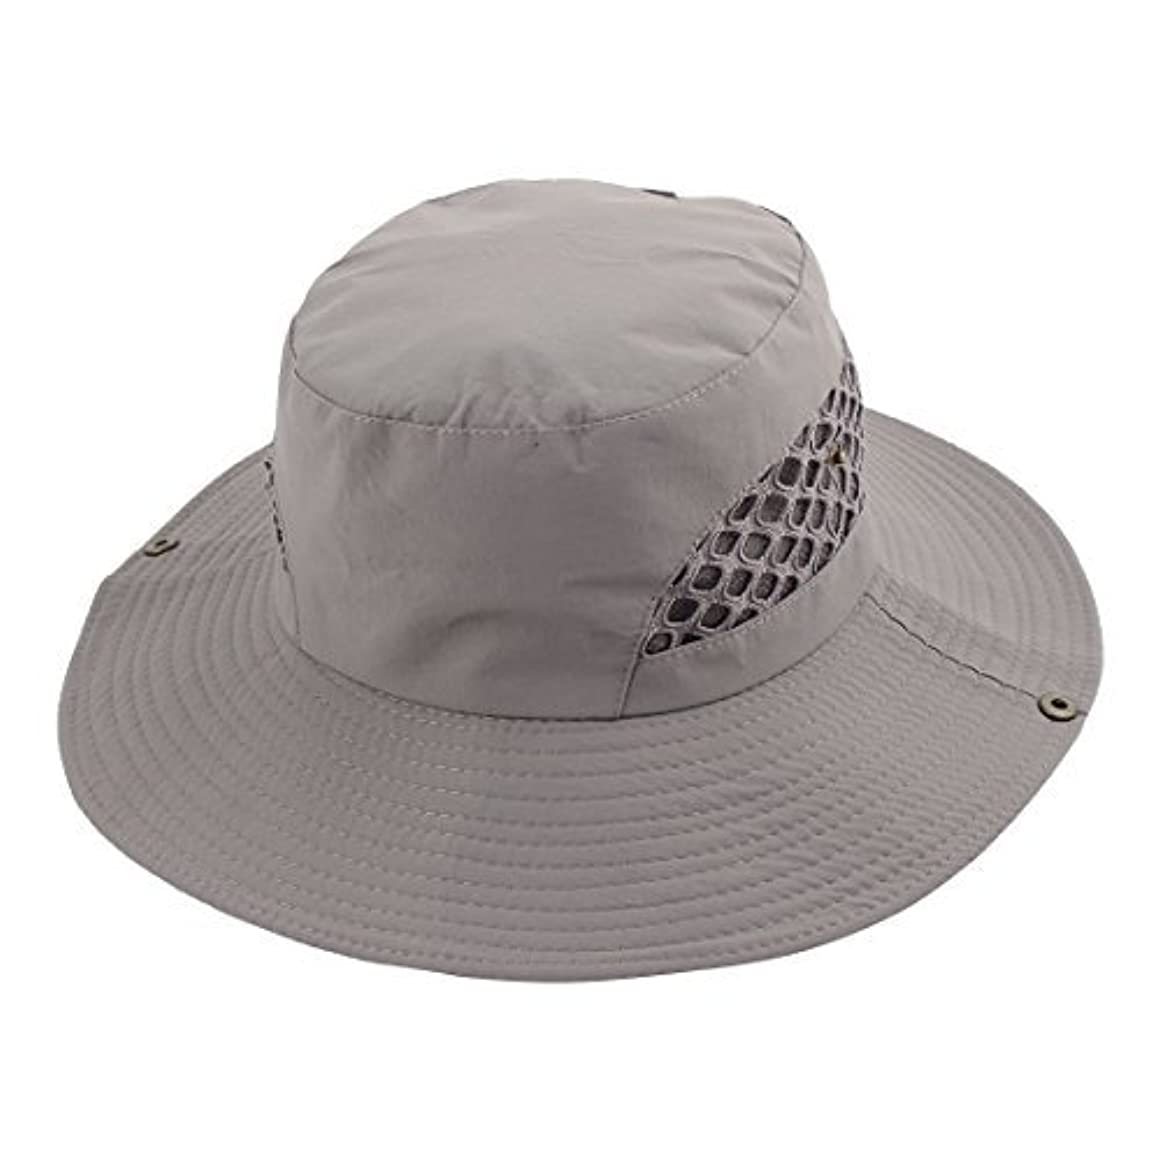 DealMux漁師アウトドアフィッシングハイキングの旅行クライミングハンティングつば広帽子帽子日バケットハットメッシュ